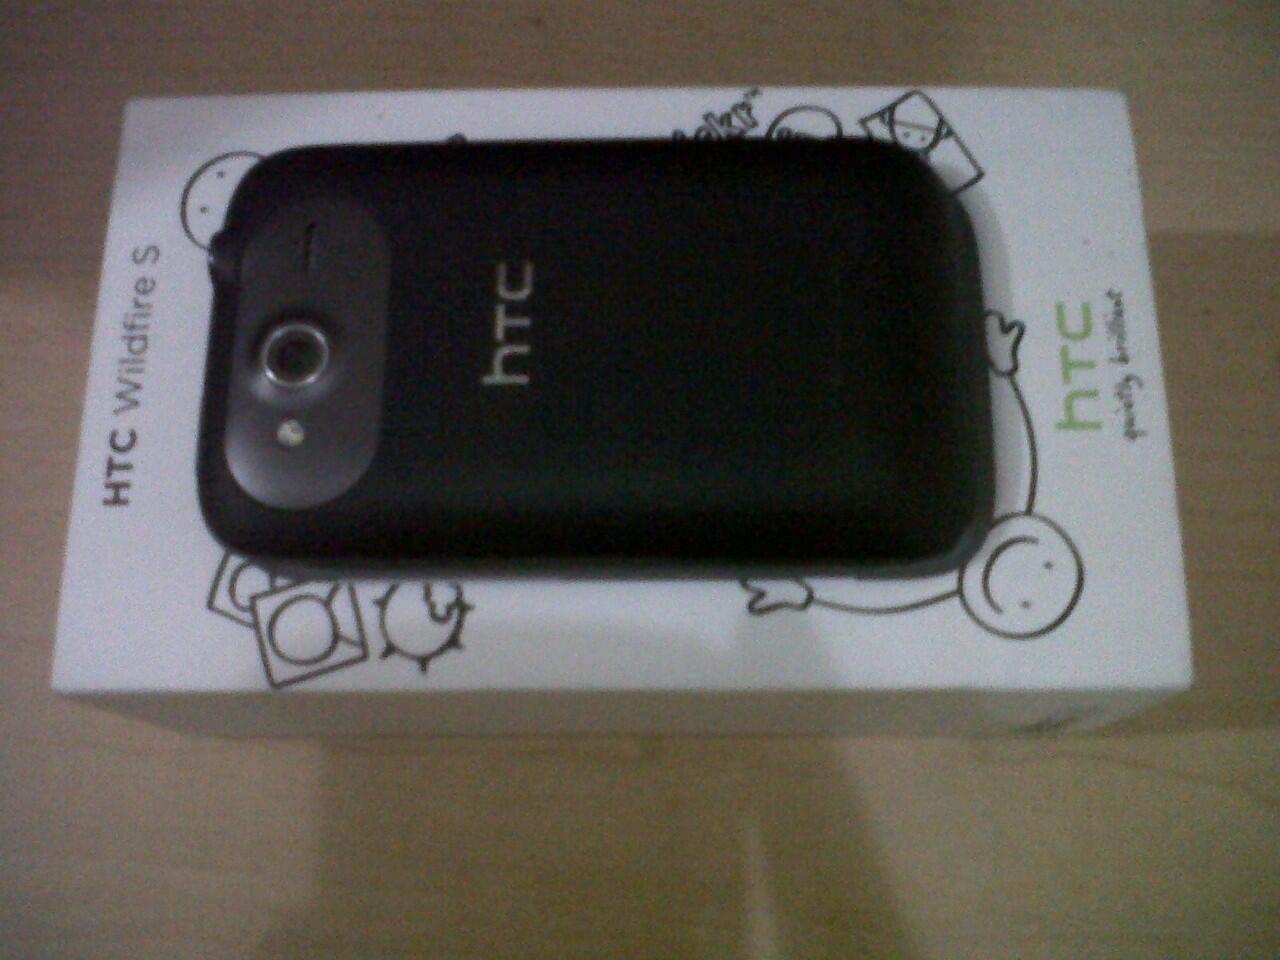 HTC Wildfire S dan Telkomsel Flash Unlimited